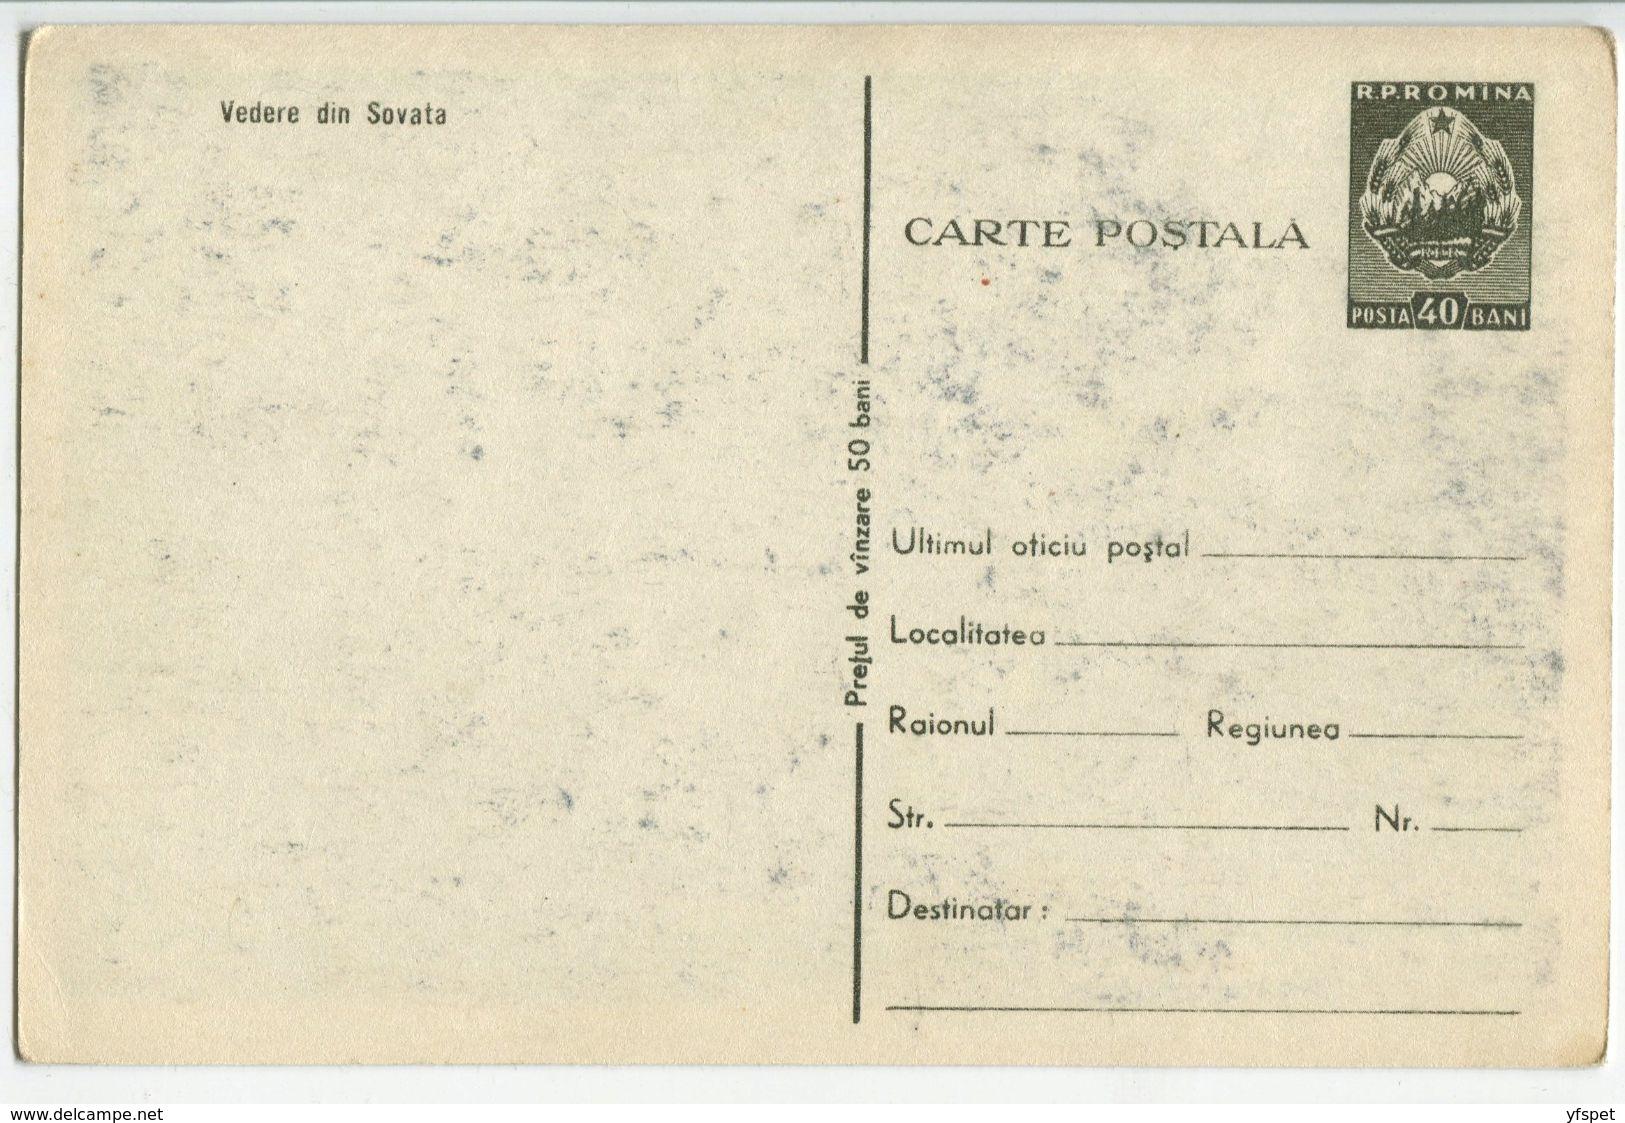 Sovata Health Resort - Picture Post Card Stationery - Romania